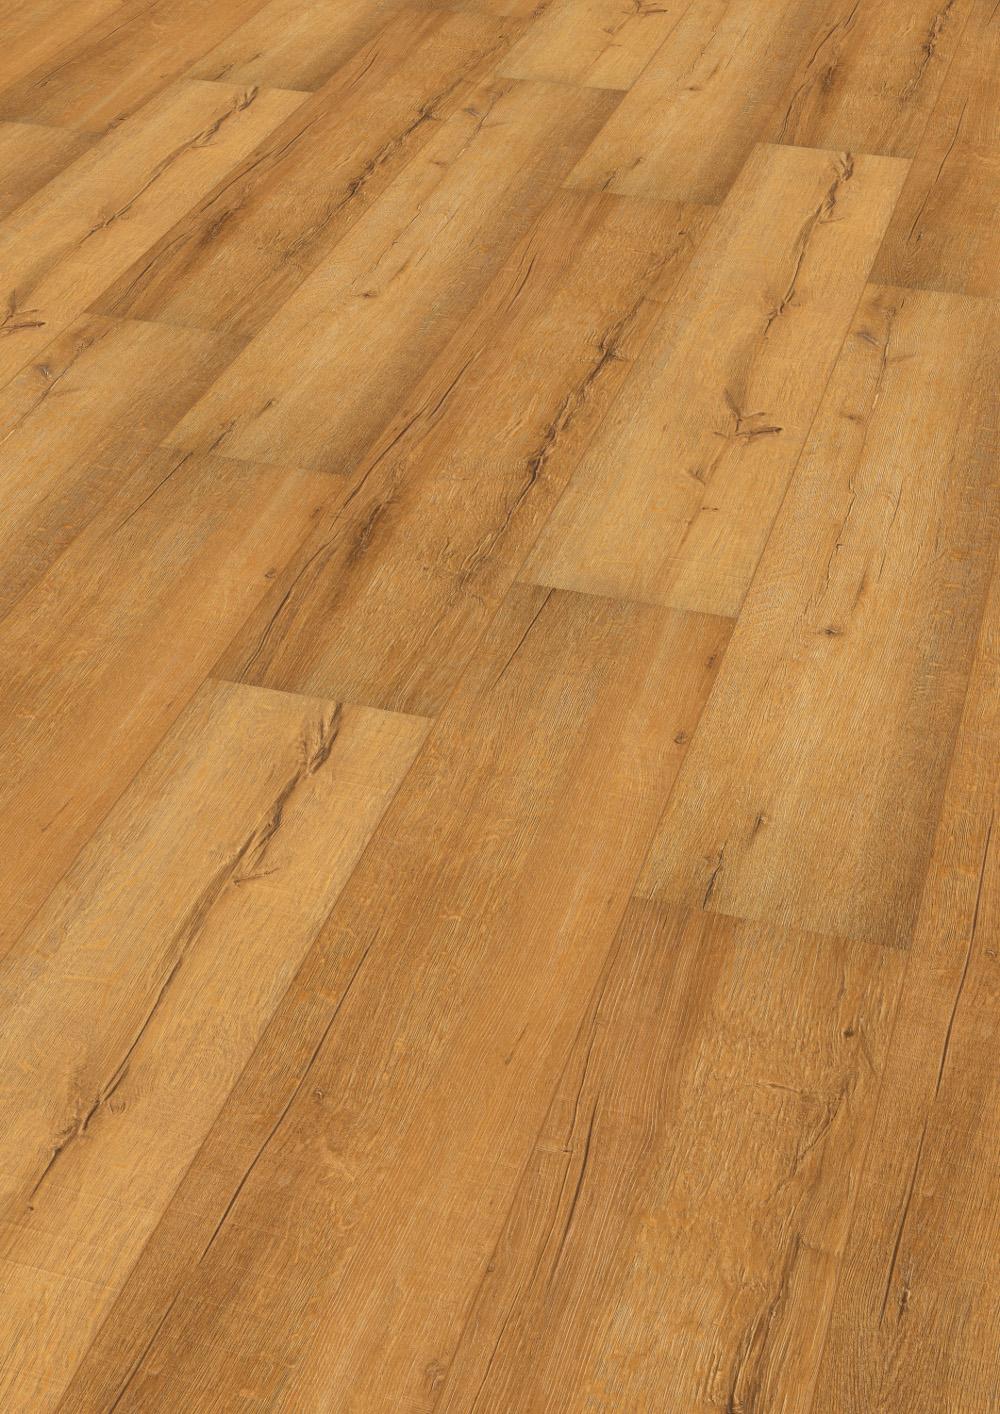 wineo laminat tirol oak honey 1 stab wineo 500 large v2. Black Bedroom Furniture Sets. Home Design Ideas